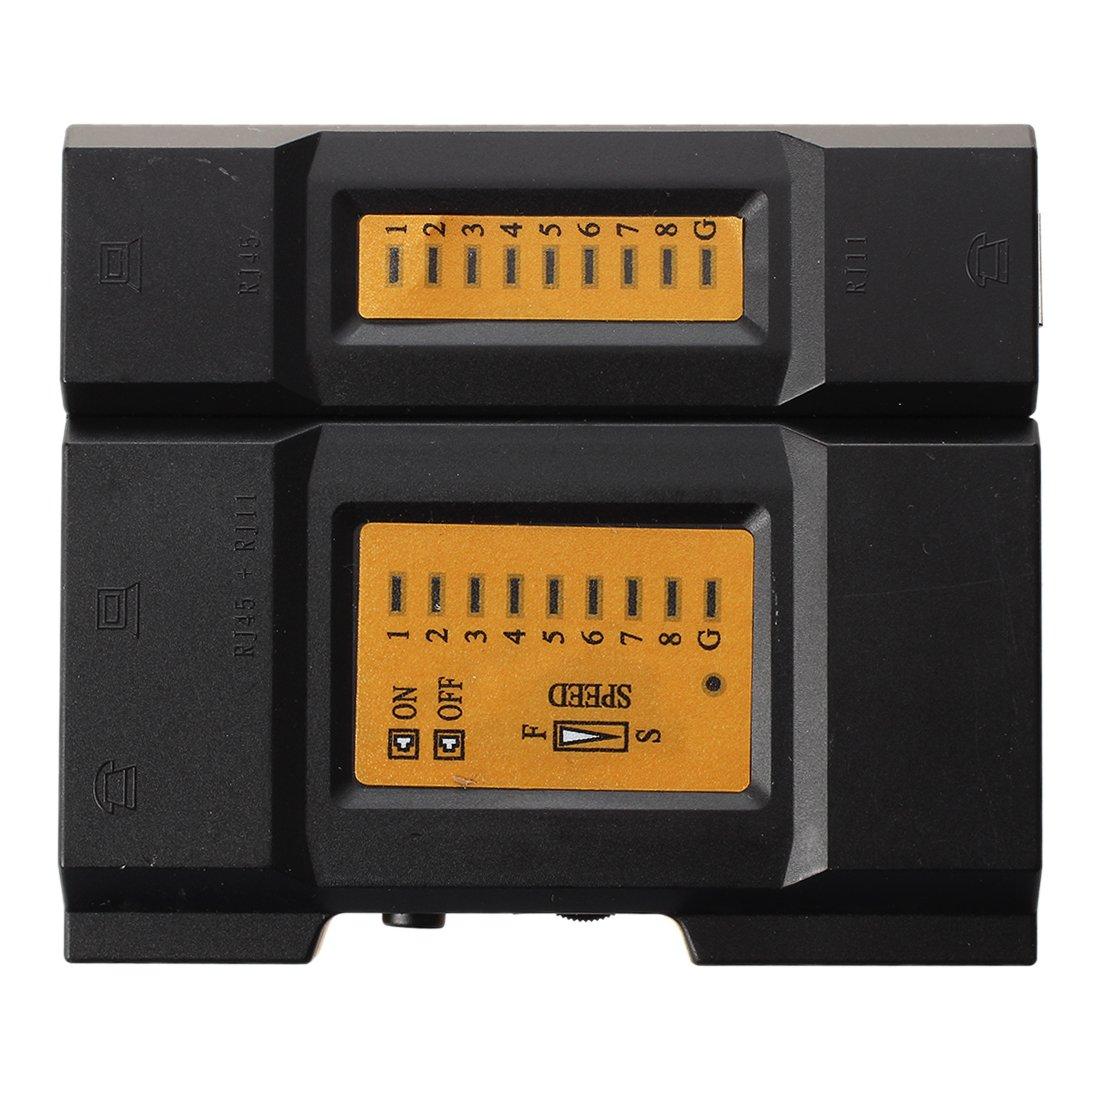 SODIAL(R) Handheld Wire RJ45 RJ11 Ethernet Network LAN Cable Tester 022126